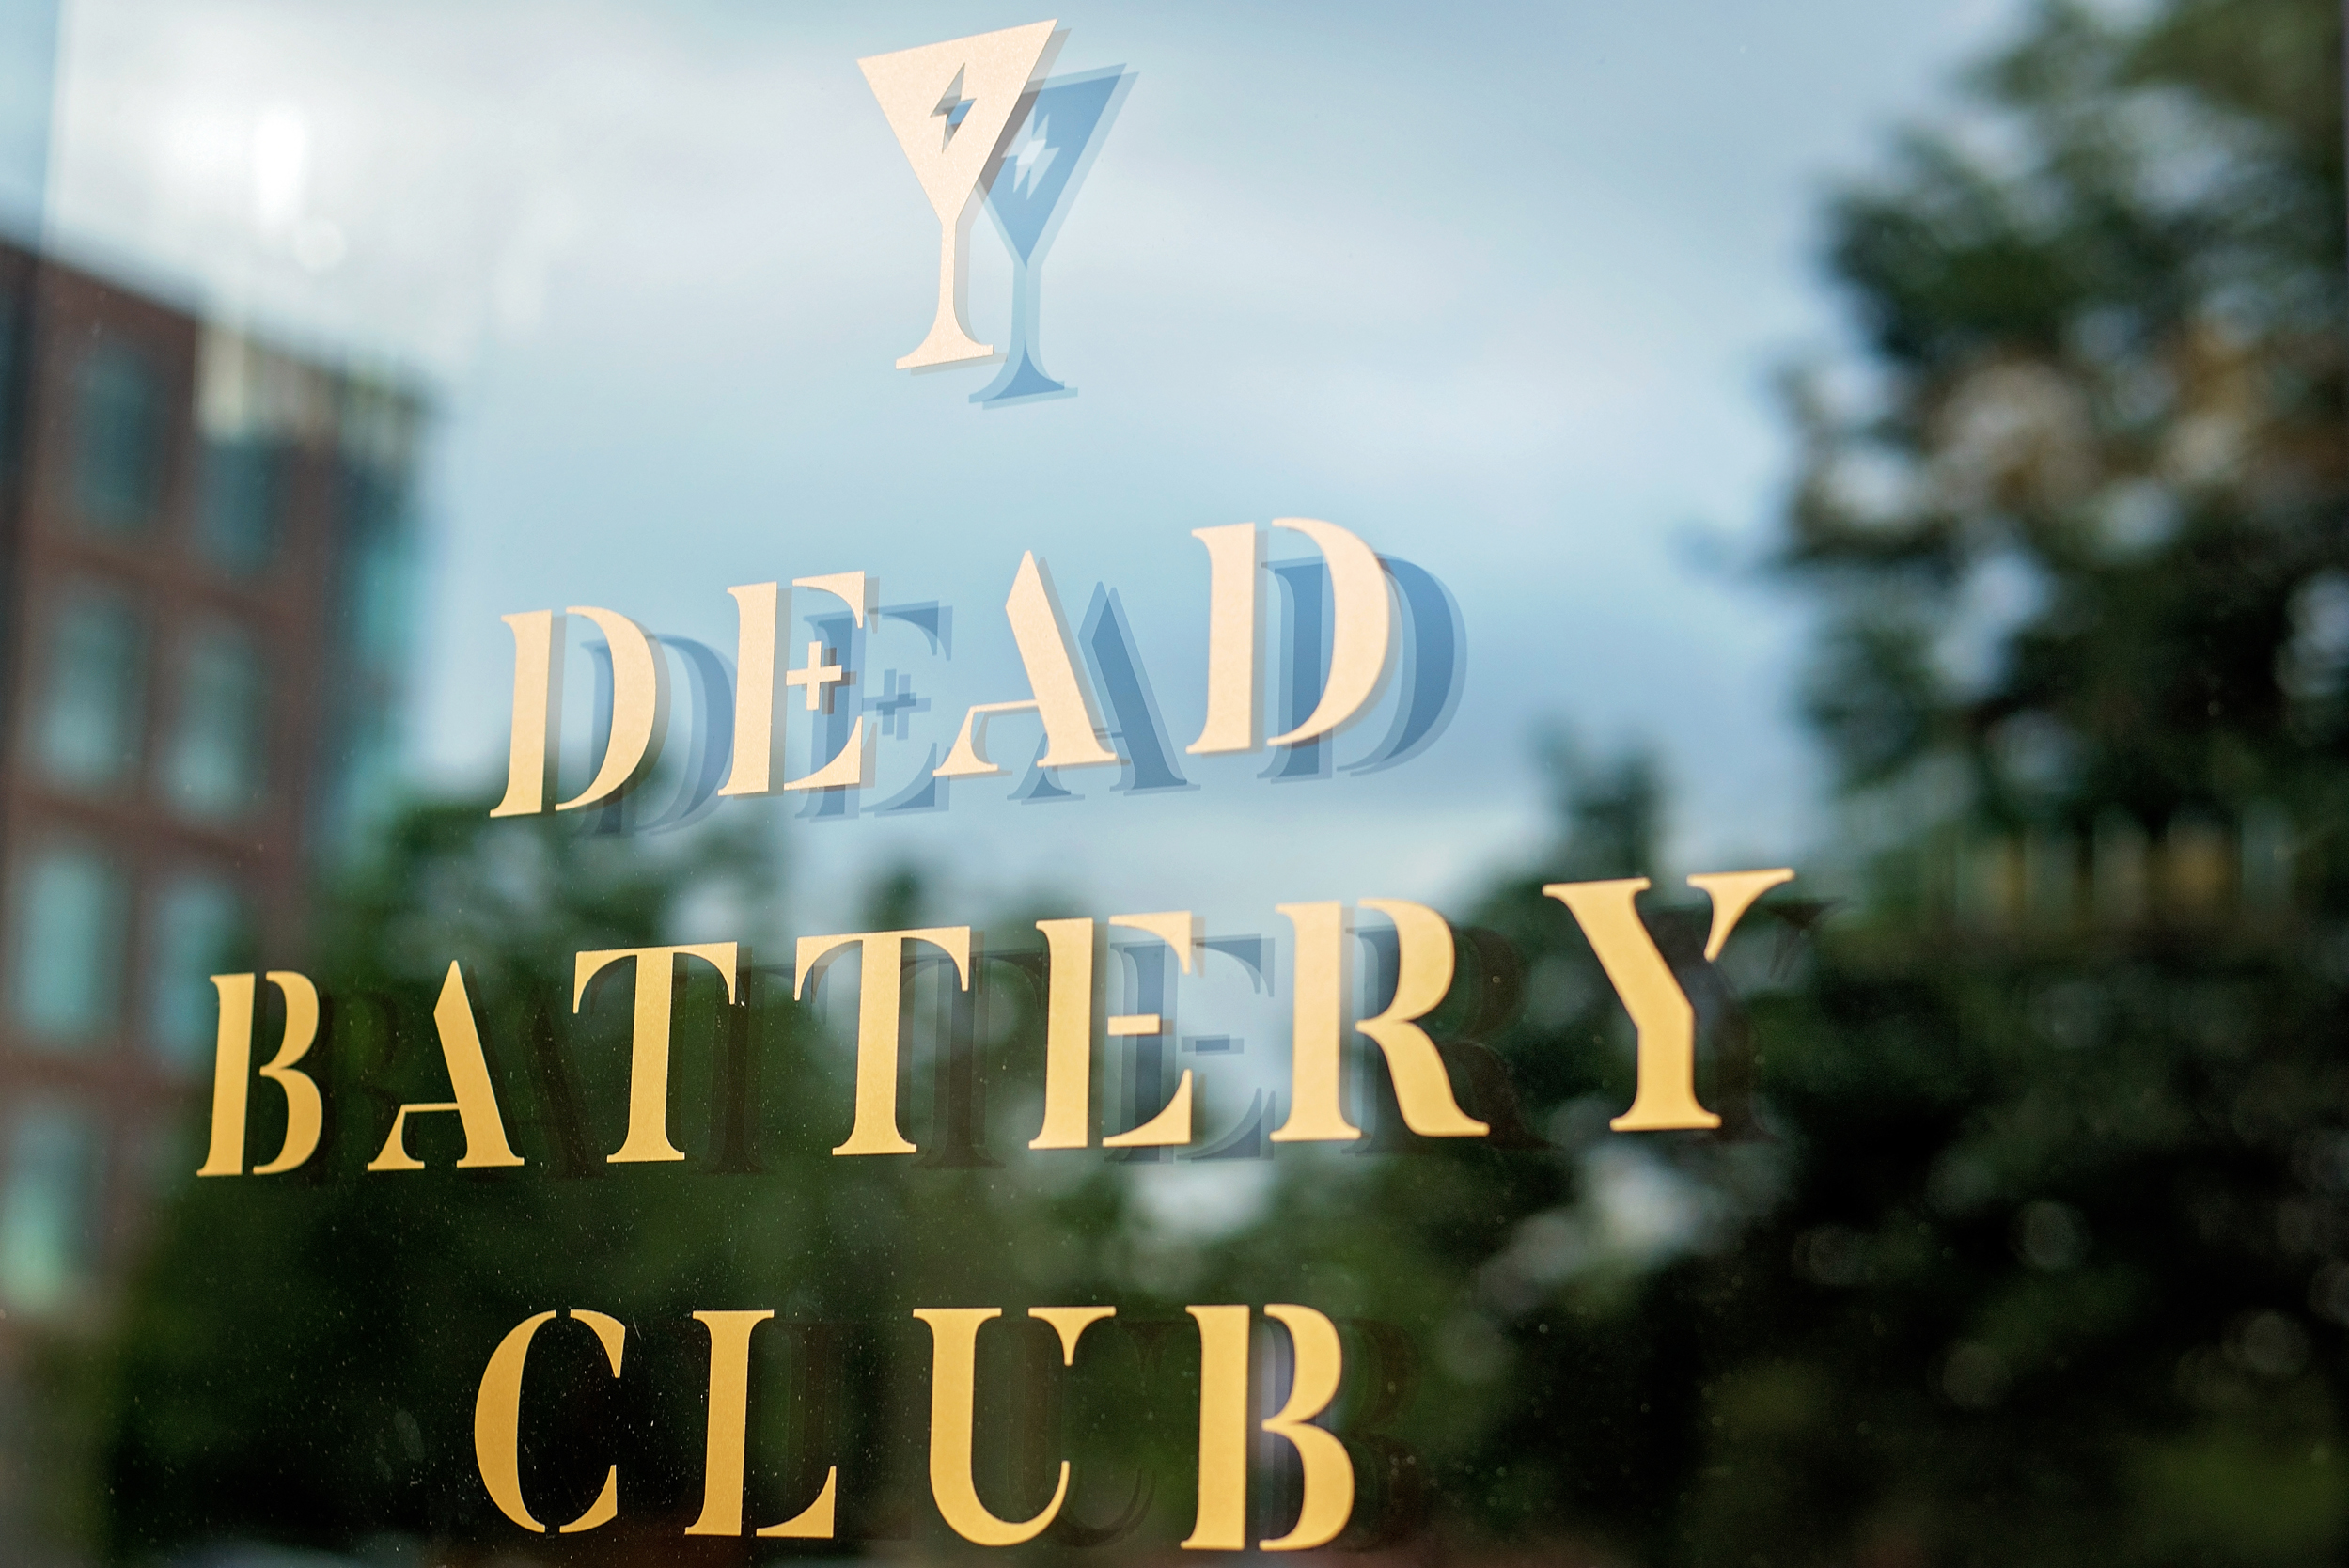 8020-builders-dead-battery-club-7.jpg